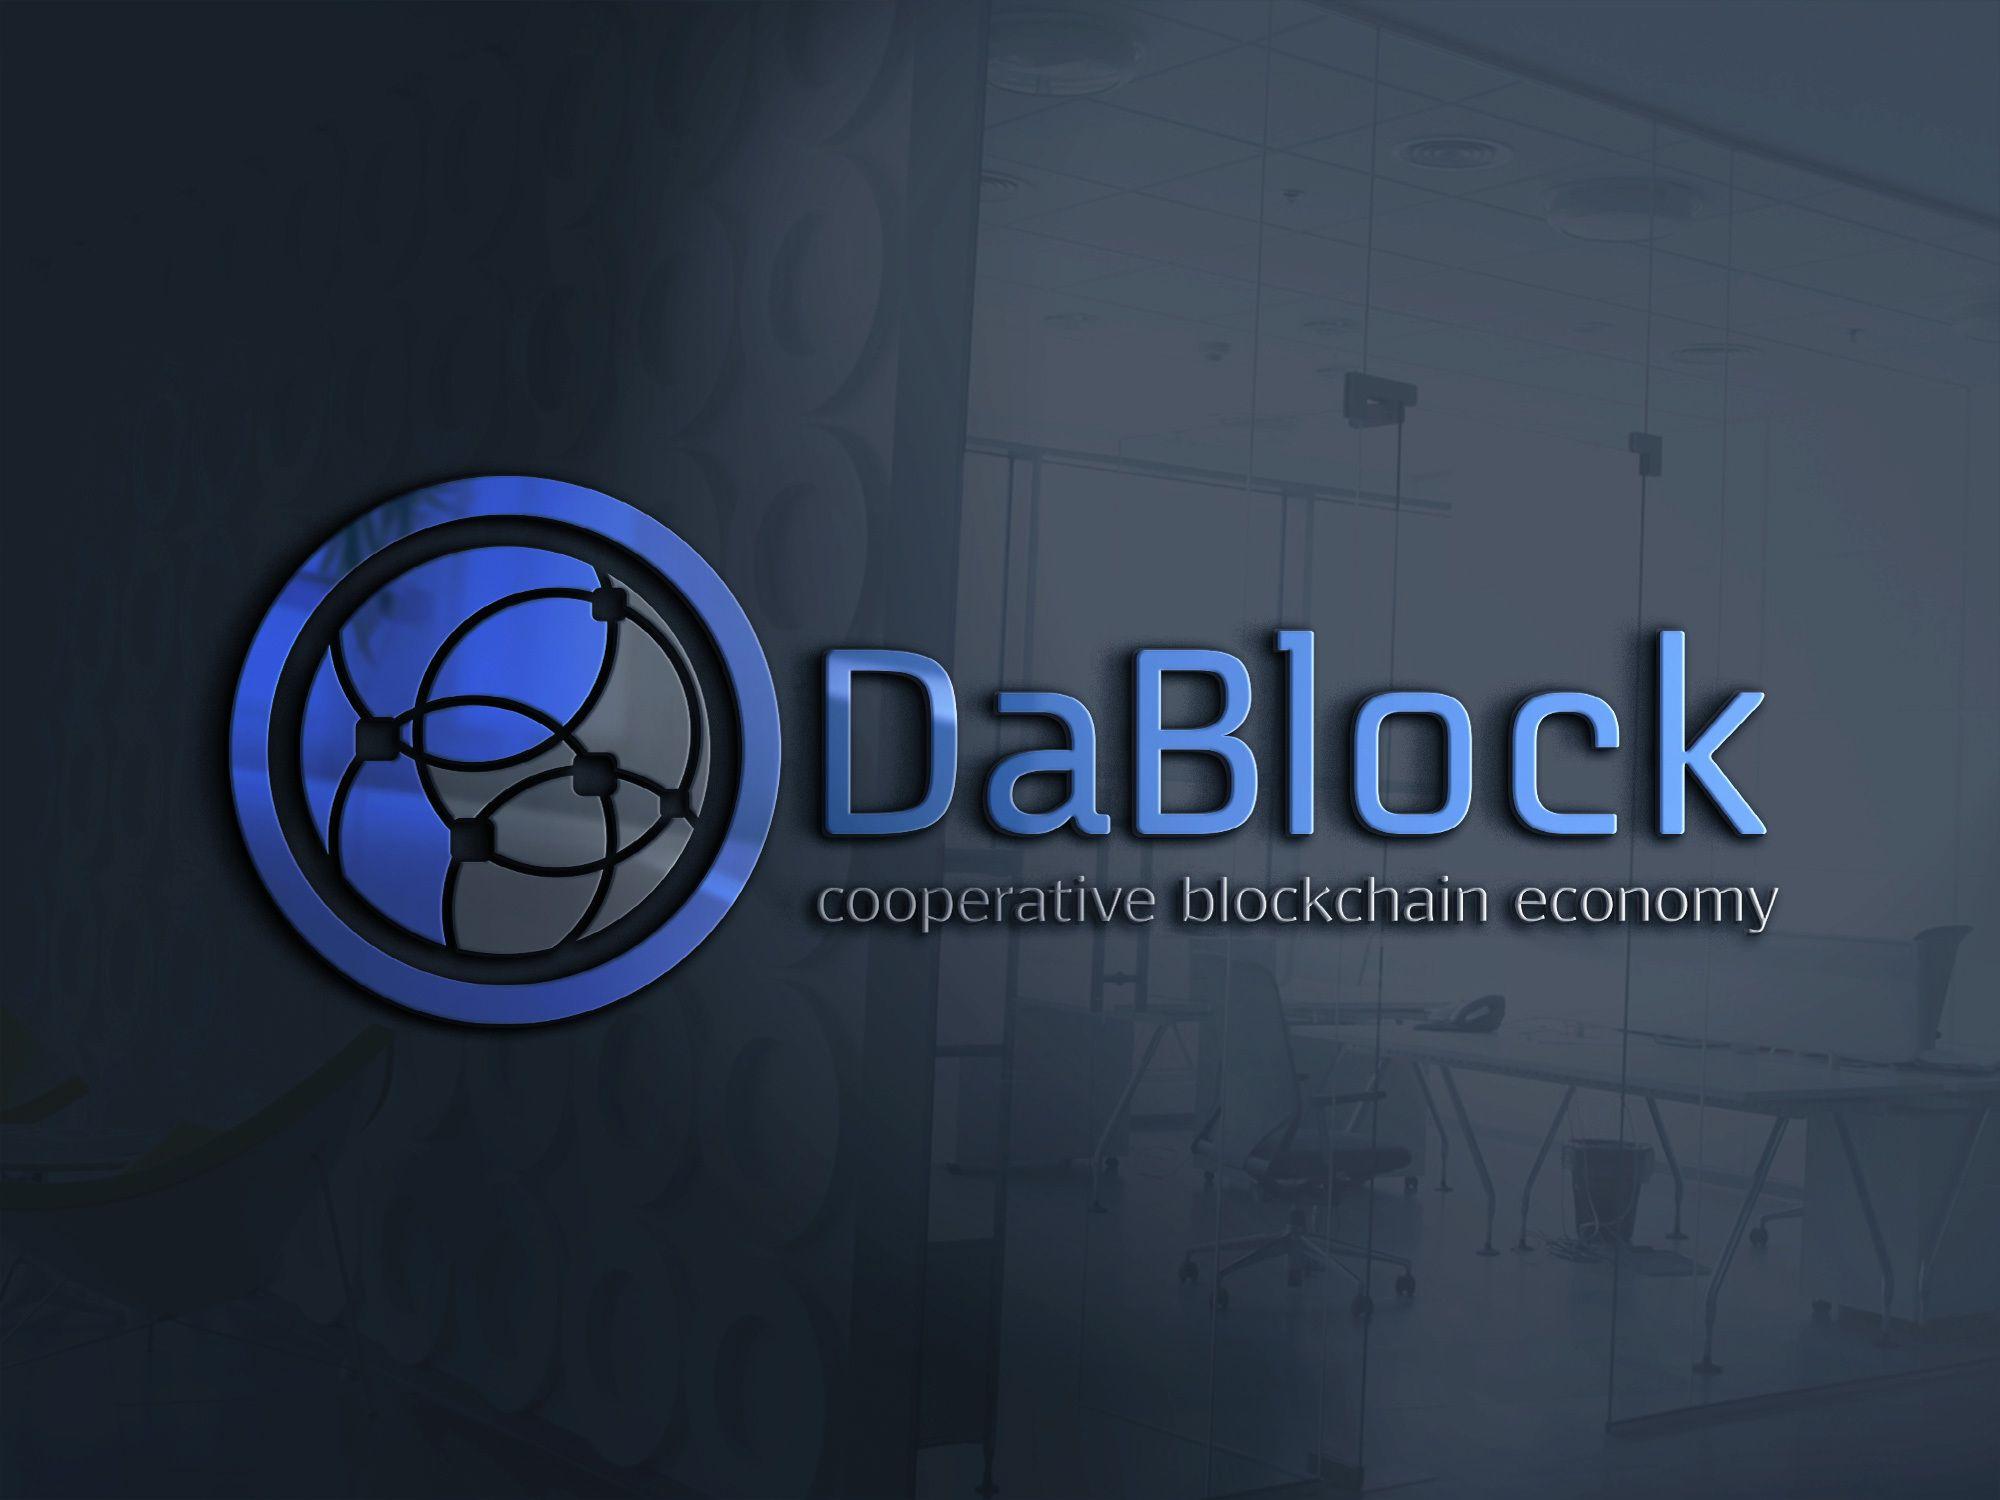 DaBlock - Cooperative Blockchain Economy